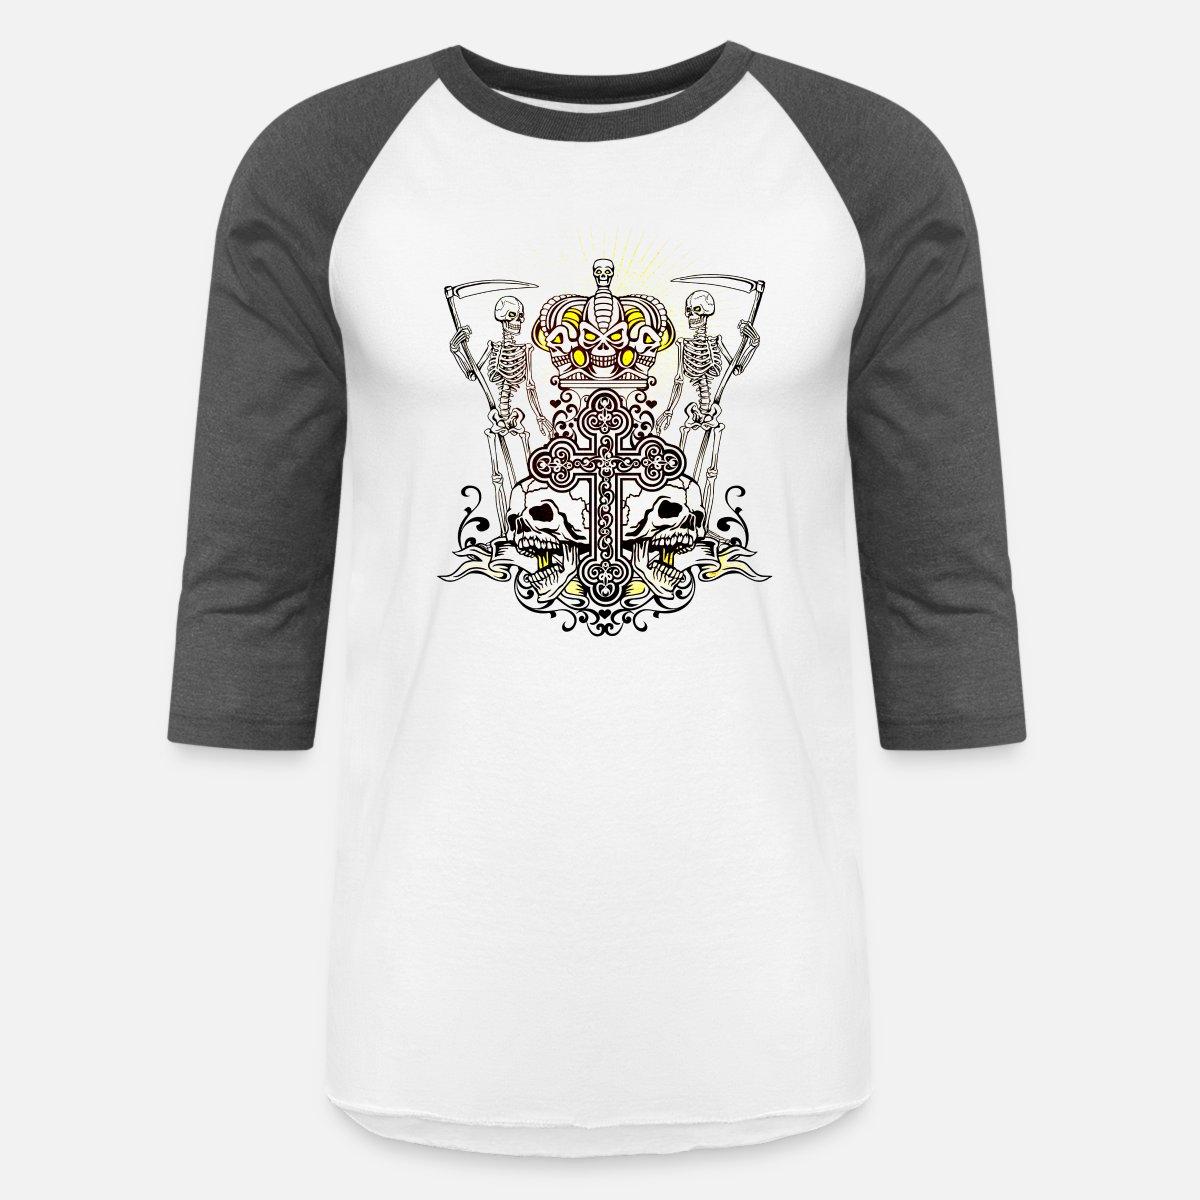 c4f00c43 Hard Rock And Heavy Metal T Shirts | Top Mode Depot